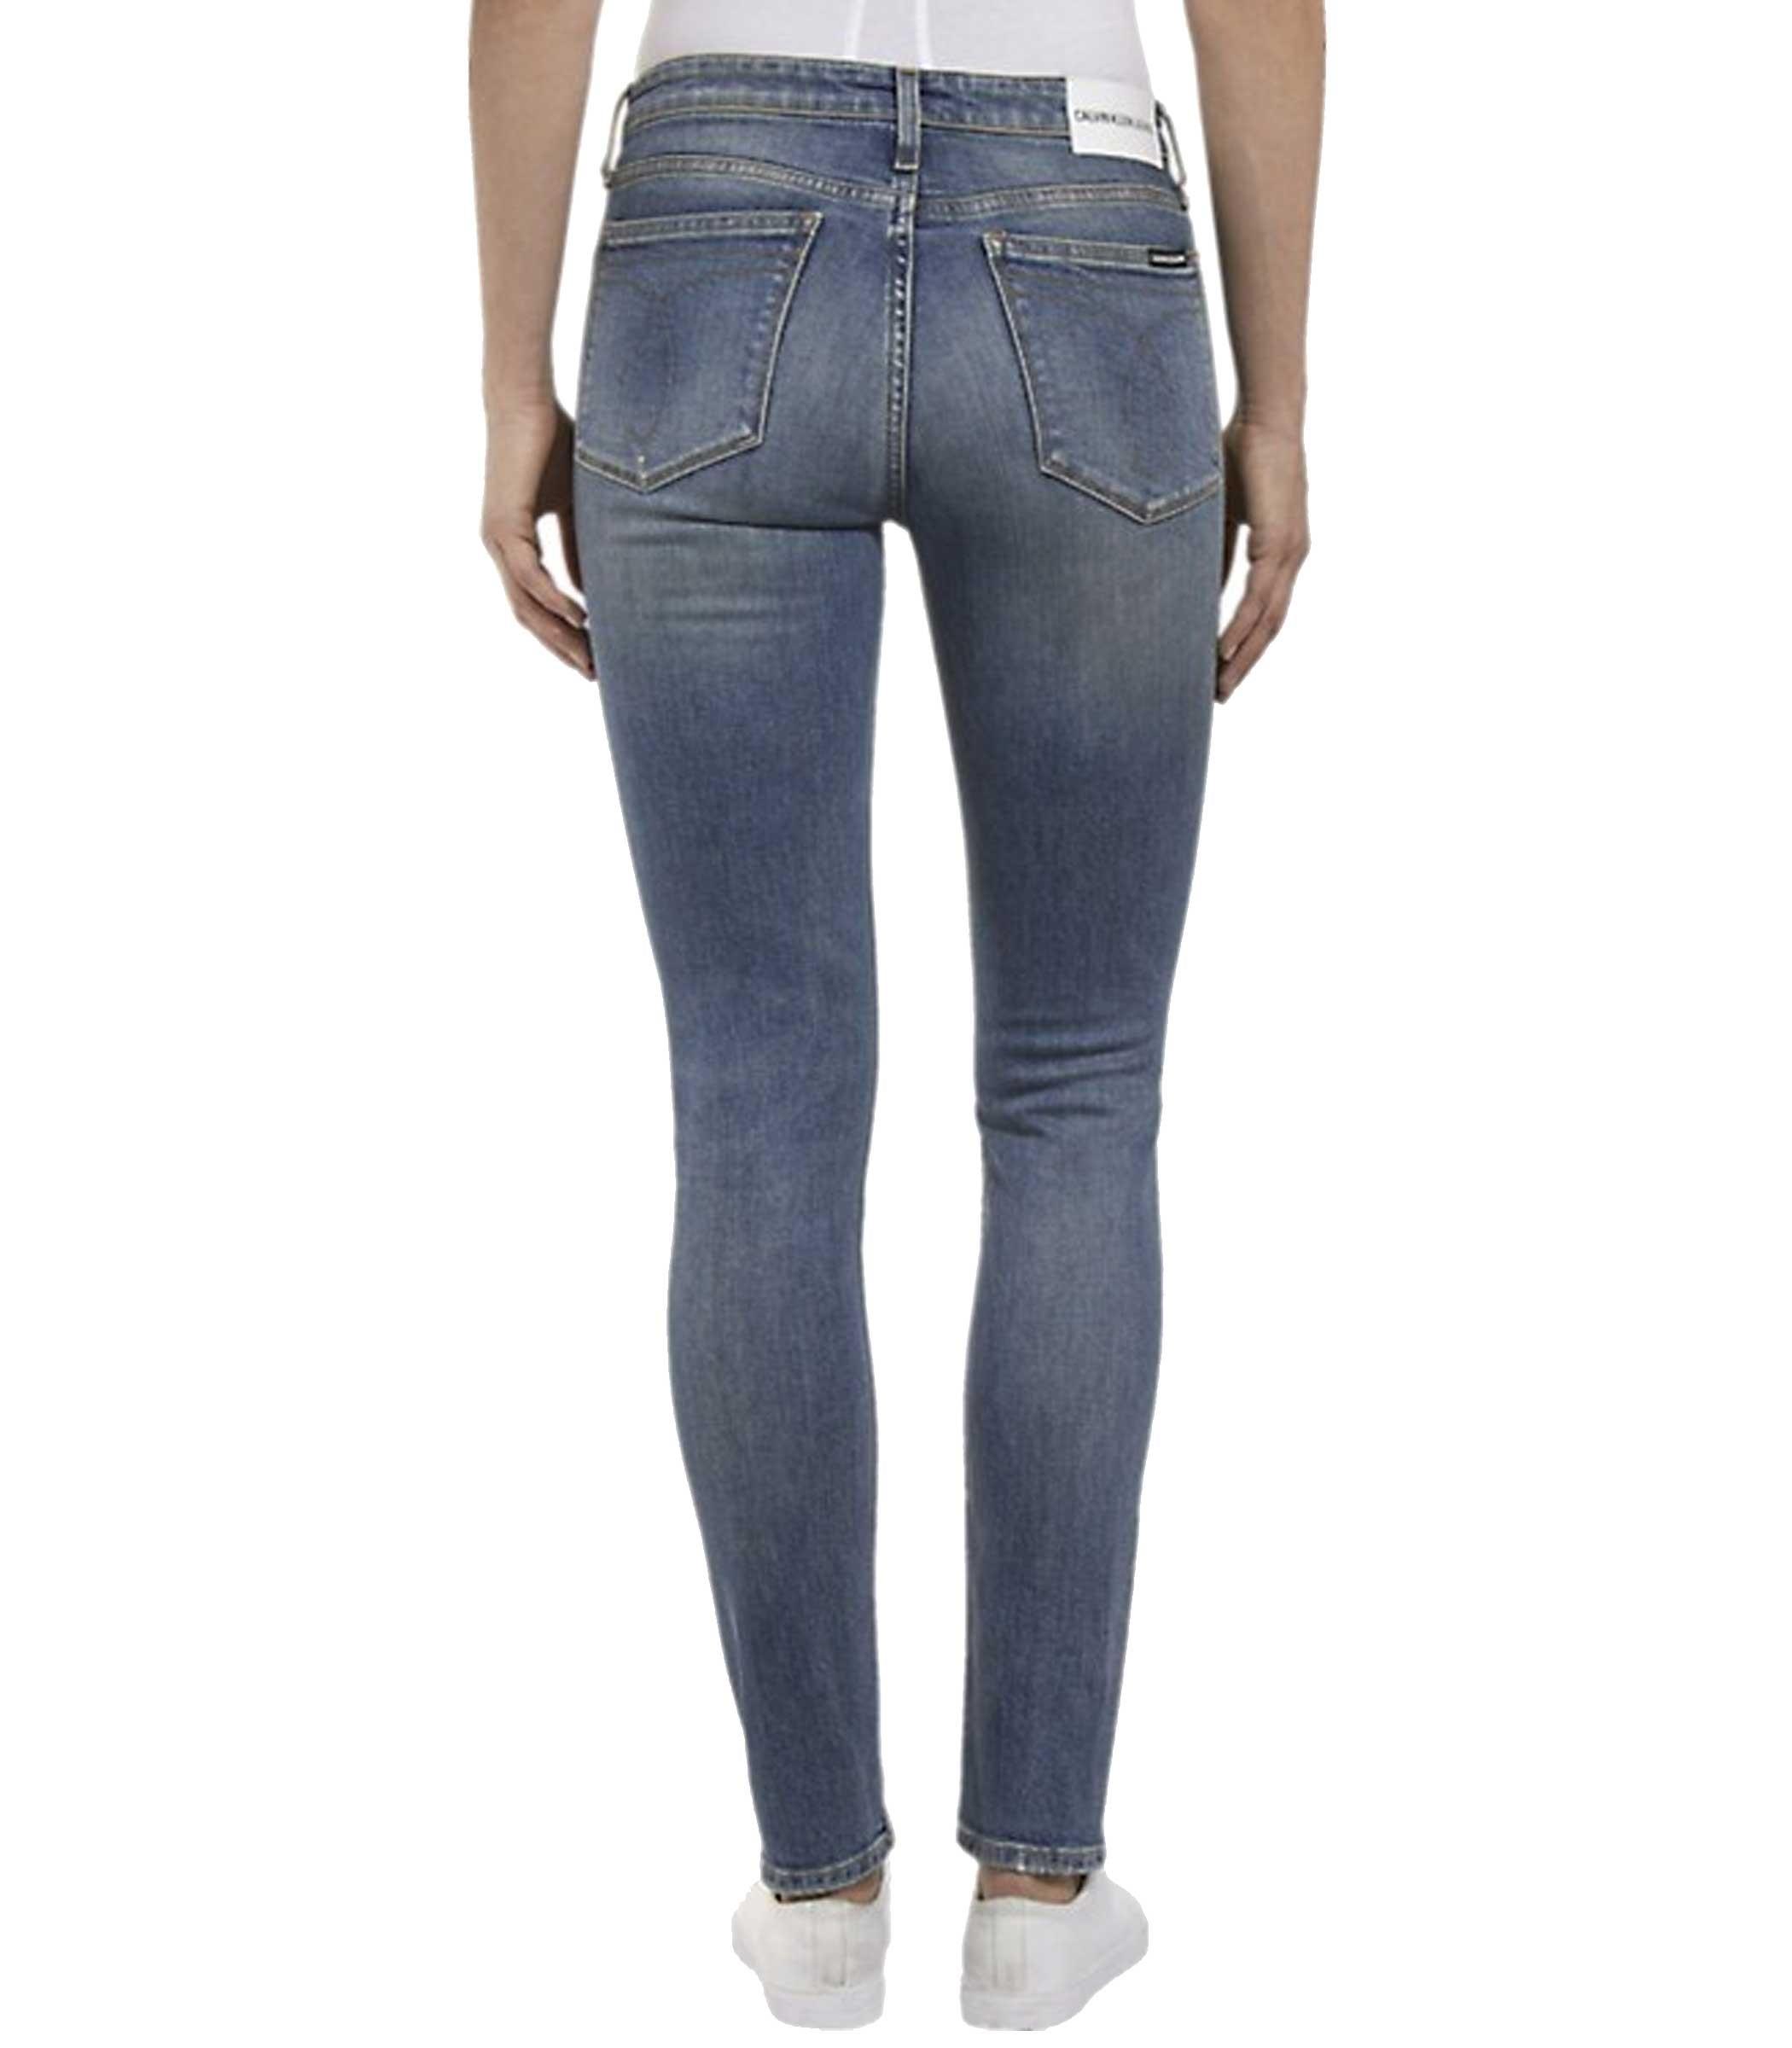 huge discount a1ee1 b936d Jeans Calvin Klein Jeans MID RISE SKI slim da donna rif ...